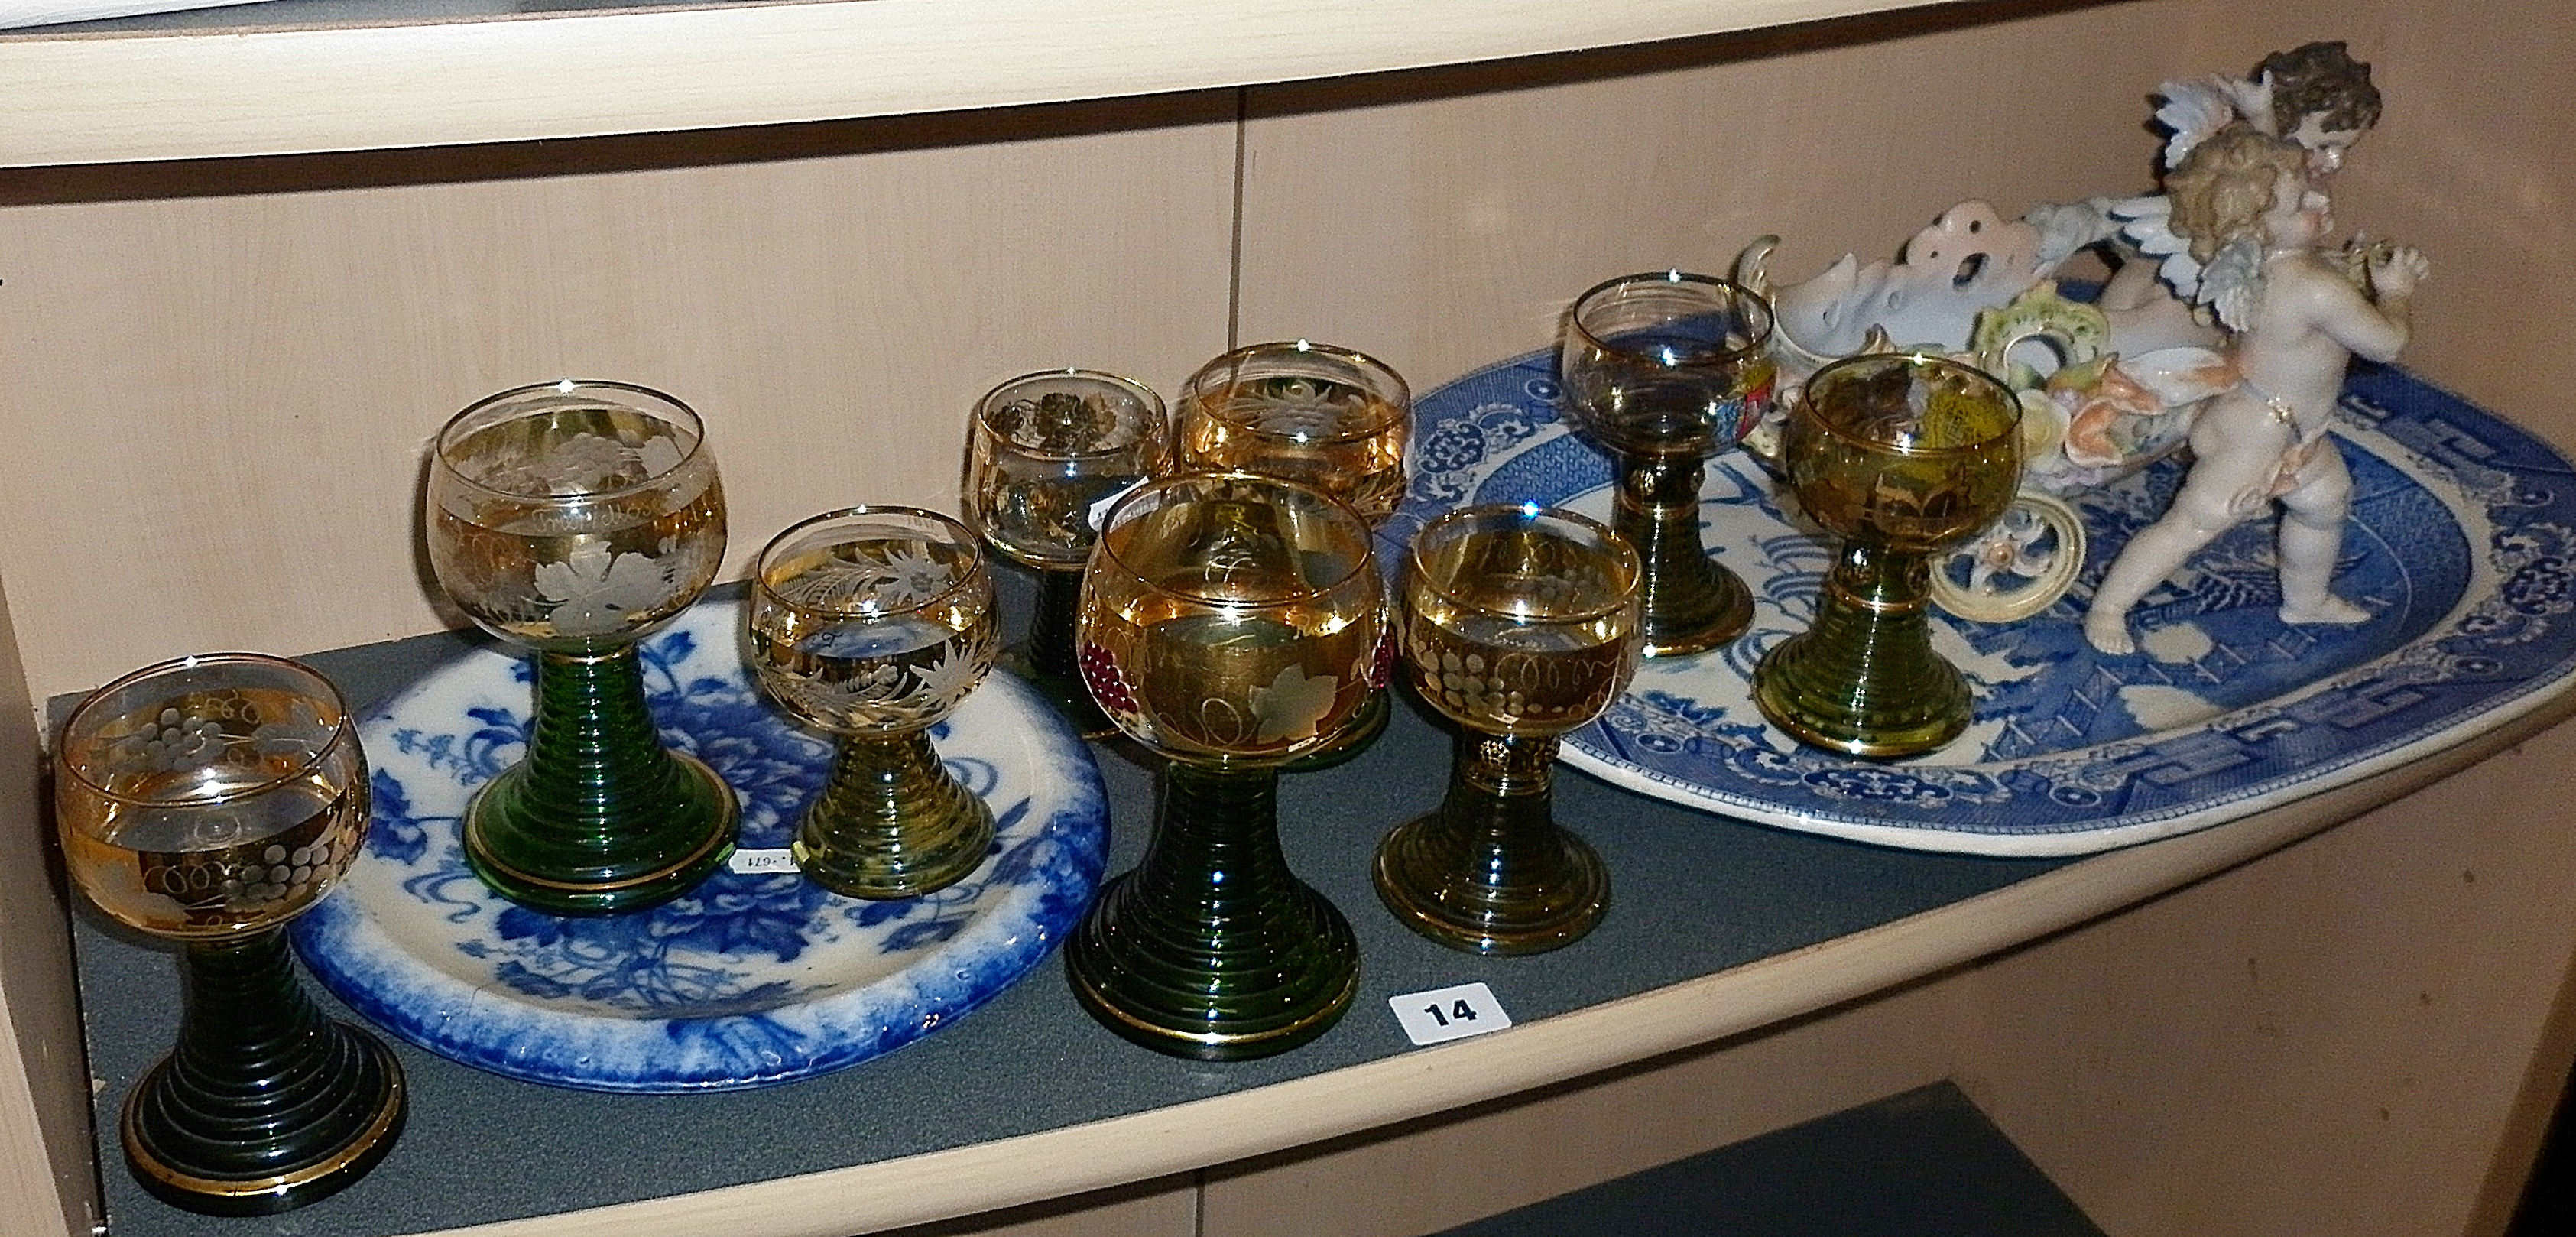 Nine assorted German Hock glasses, having gold vine leaf decoration and green stepped stems, a